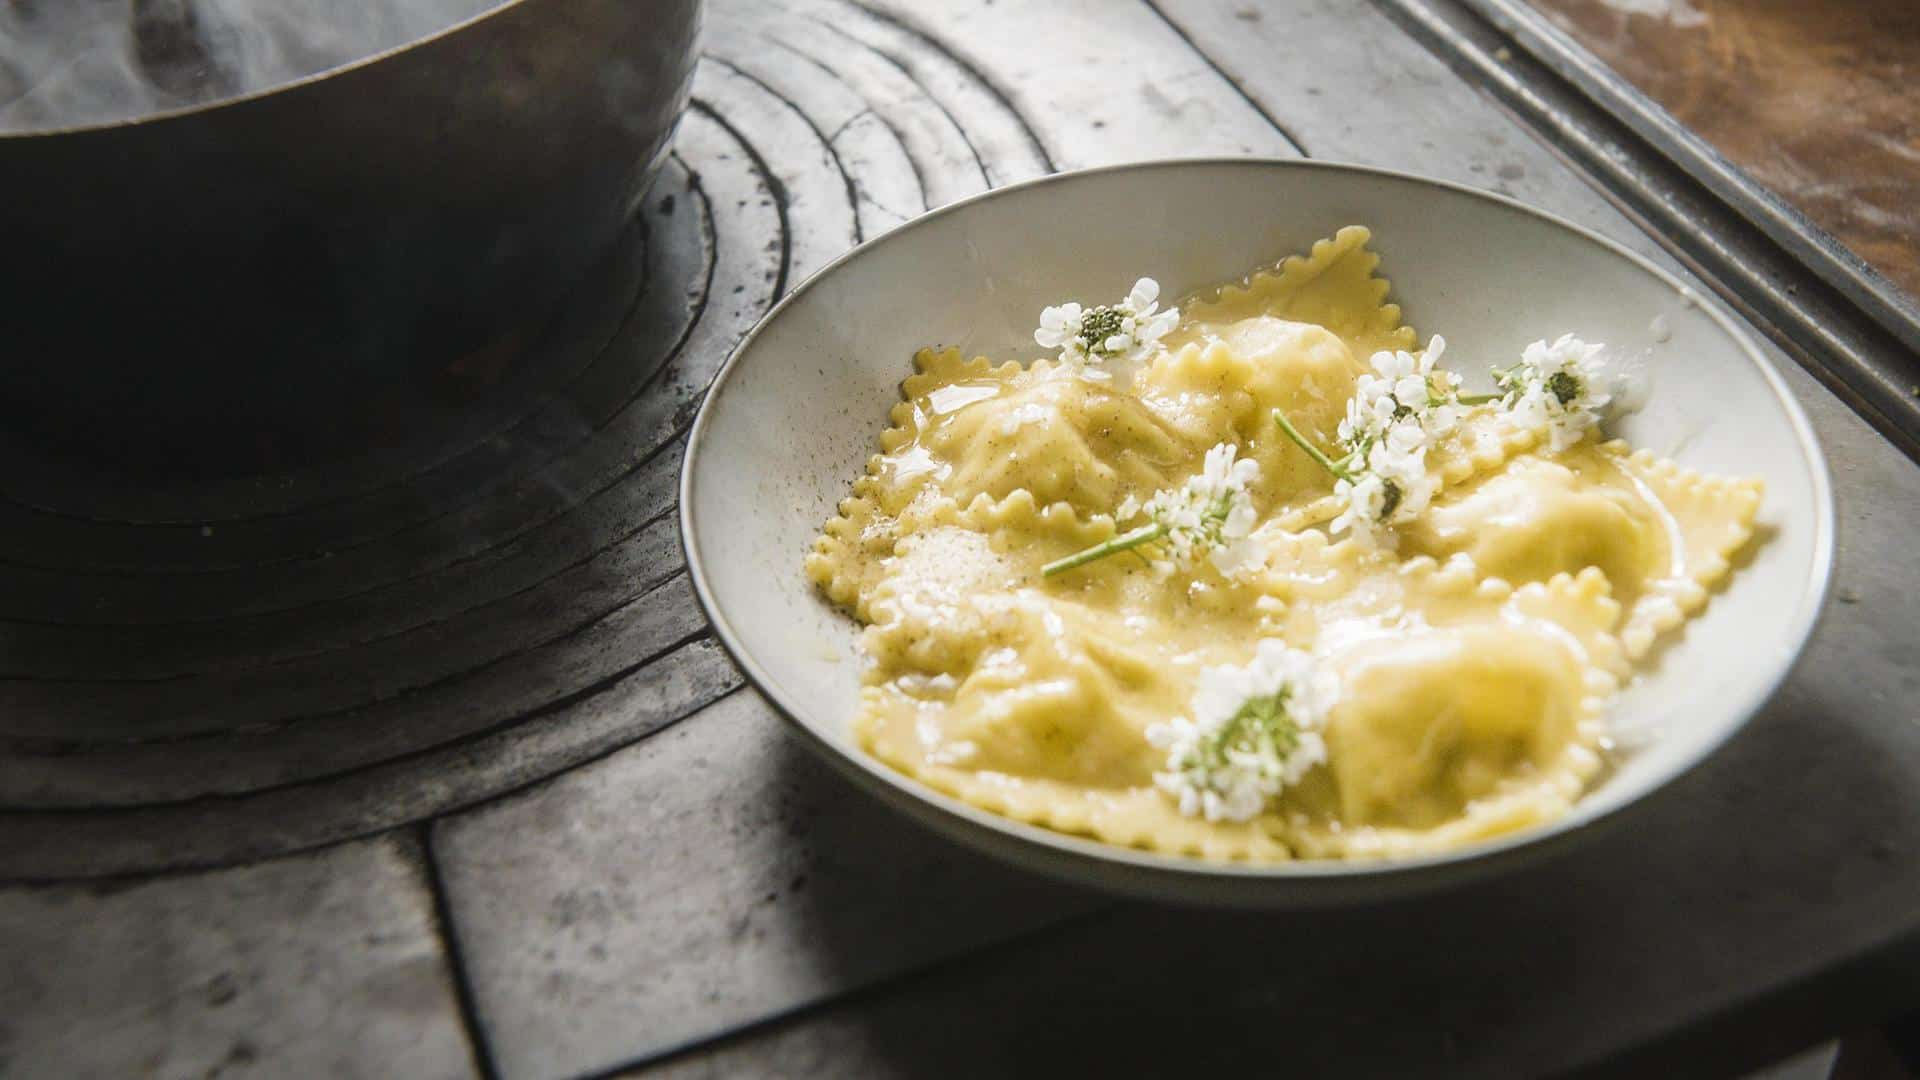 Ravioli con patate, Bavaria Blu e noci una ricetta di Riccardo De Pra